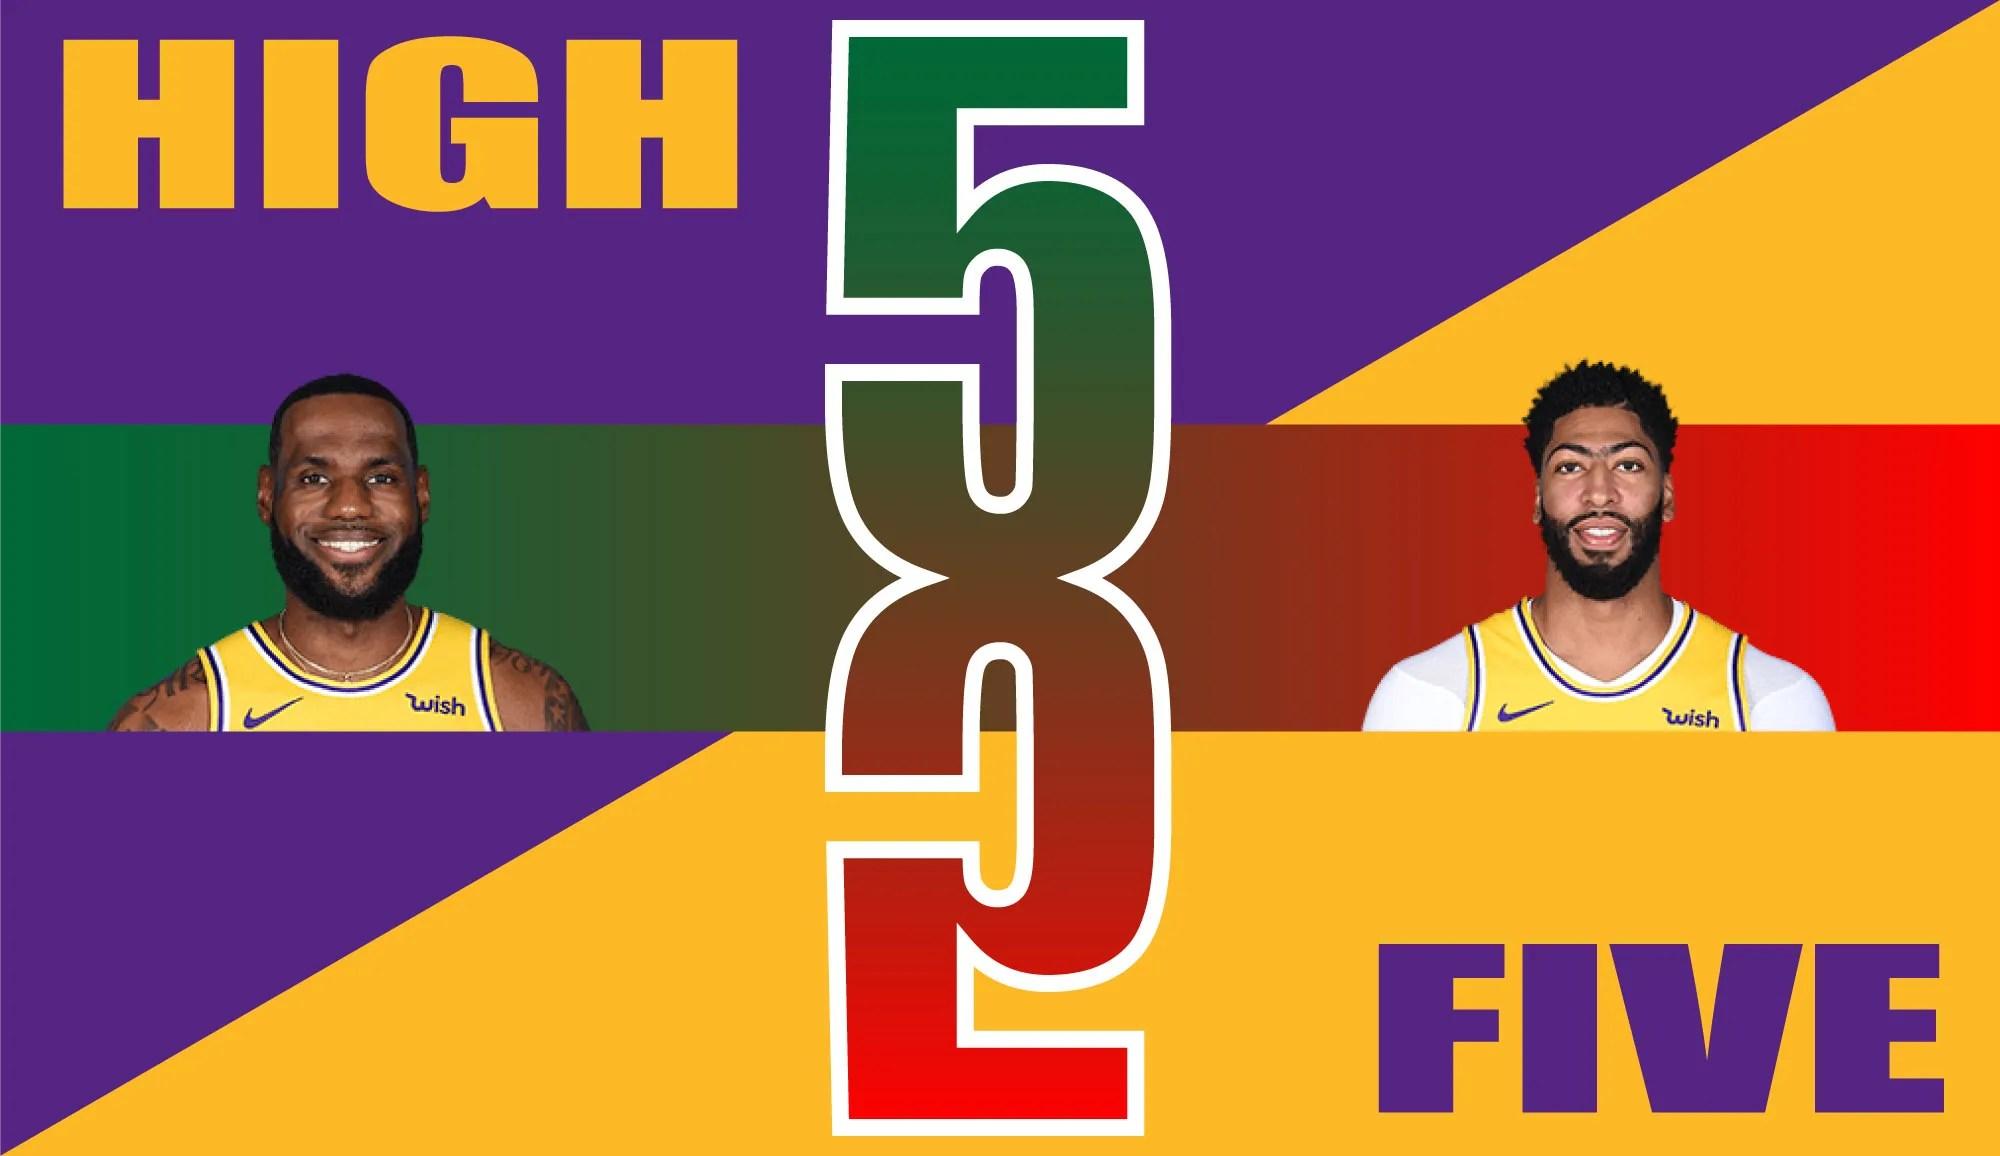 High Five, LeBron James and Anthony Davis